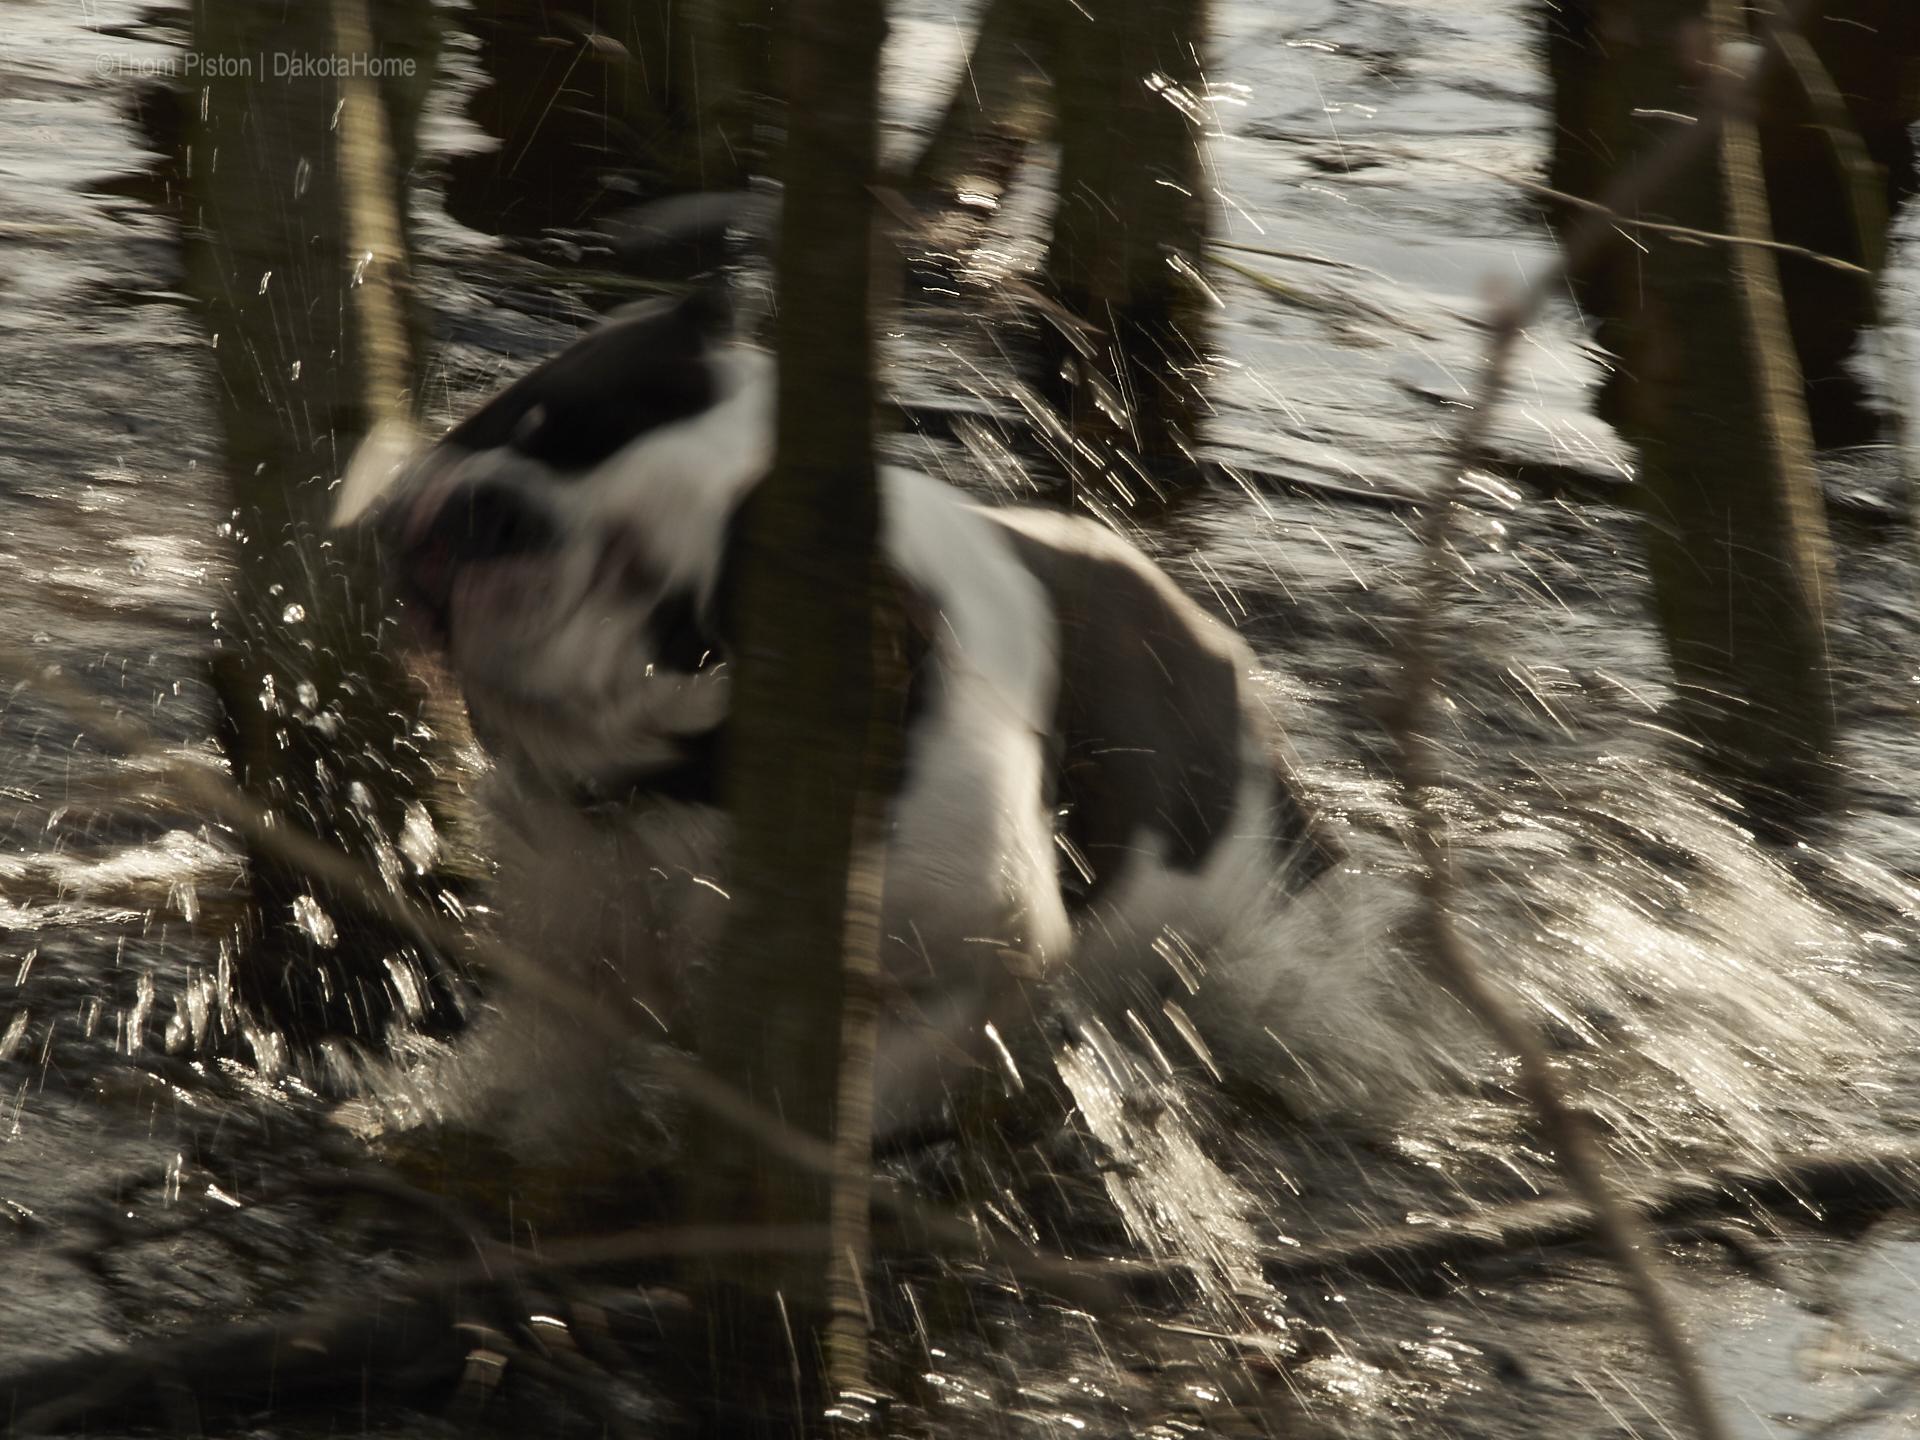 die bulldogge alwin anfang april am anbaden